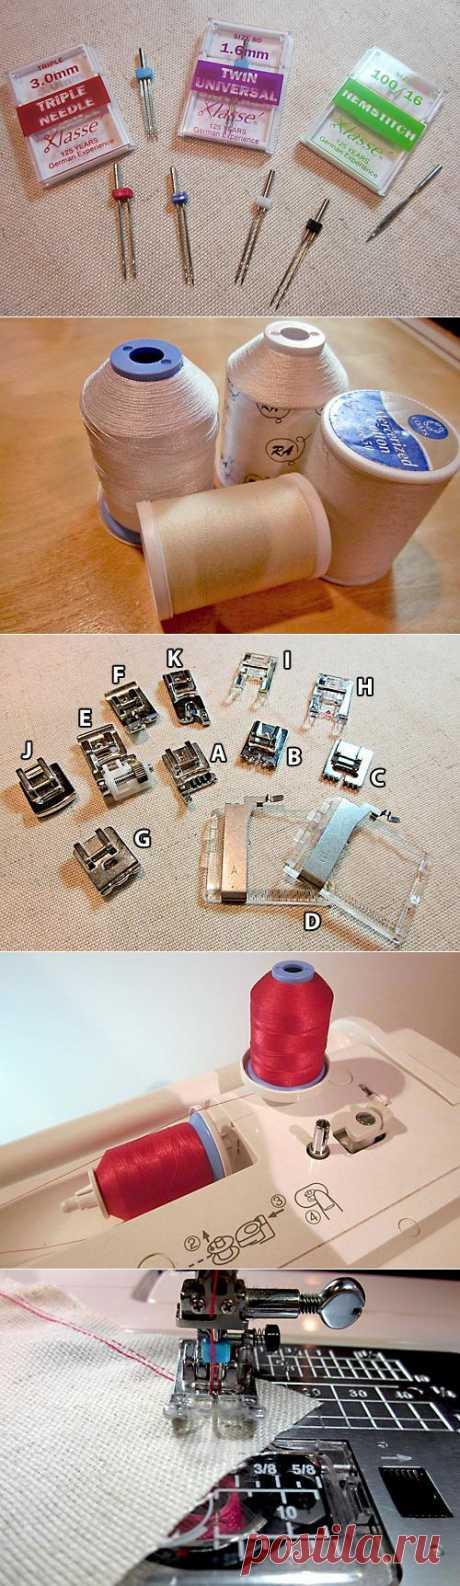 Все старое ново снова с Fabric.com: Basic Мережки на машины | Sew4Home